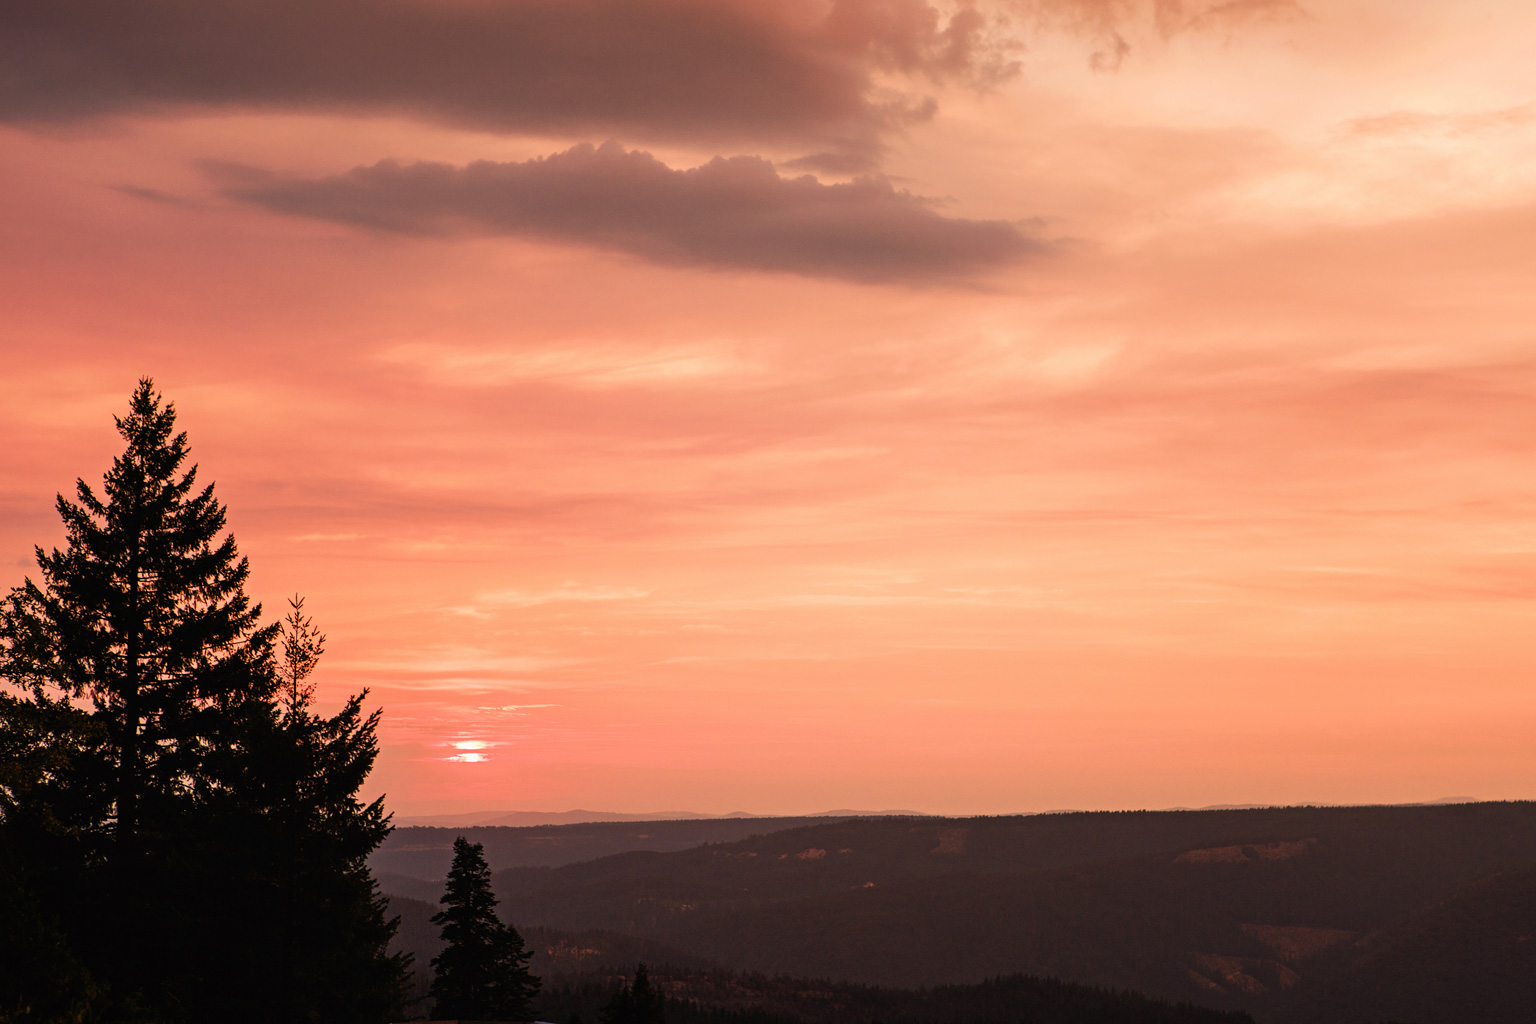 CindyGiovagnoli_California_Nevada_photographer_NevadaCity_PerseidMeteorShower_StampedeReservoir_truck_camping_VirginiaCity_MarkTwain_sunset-017.jpg